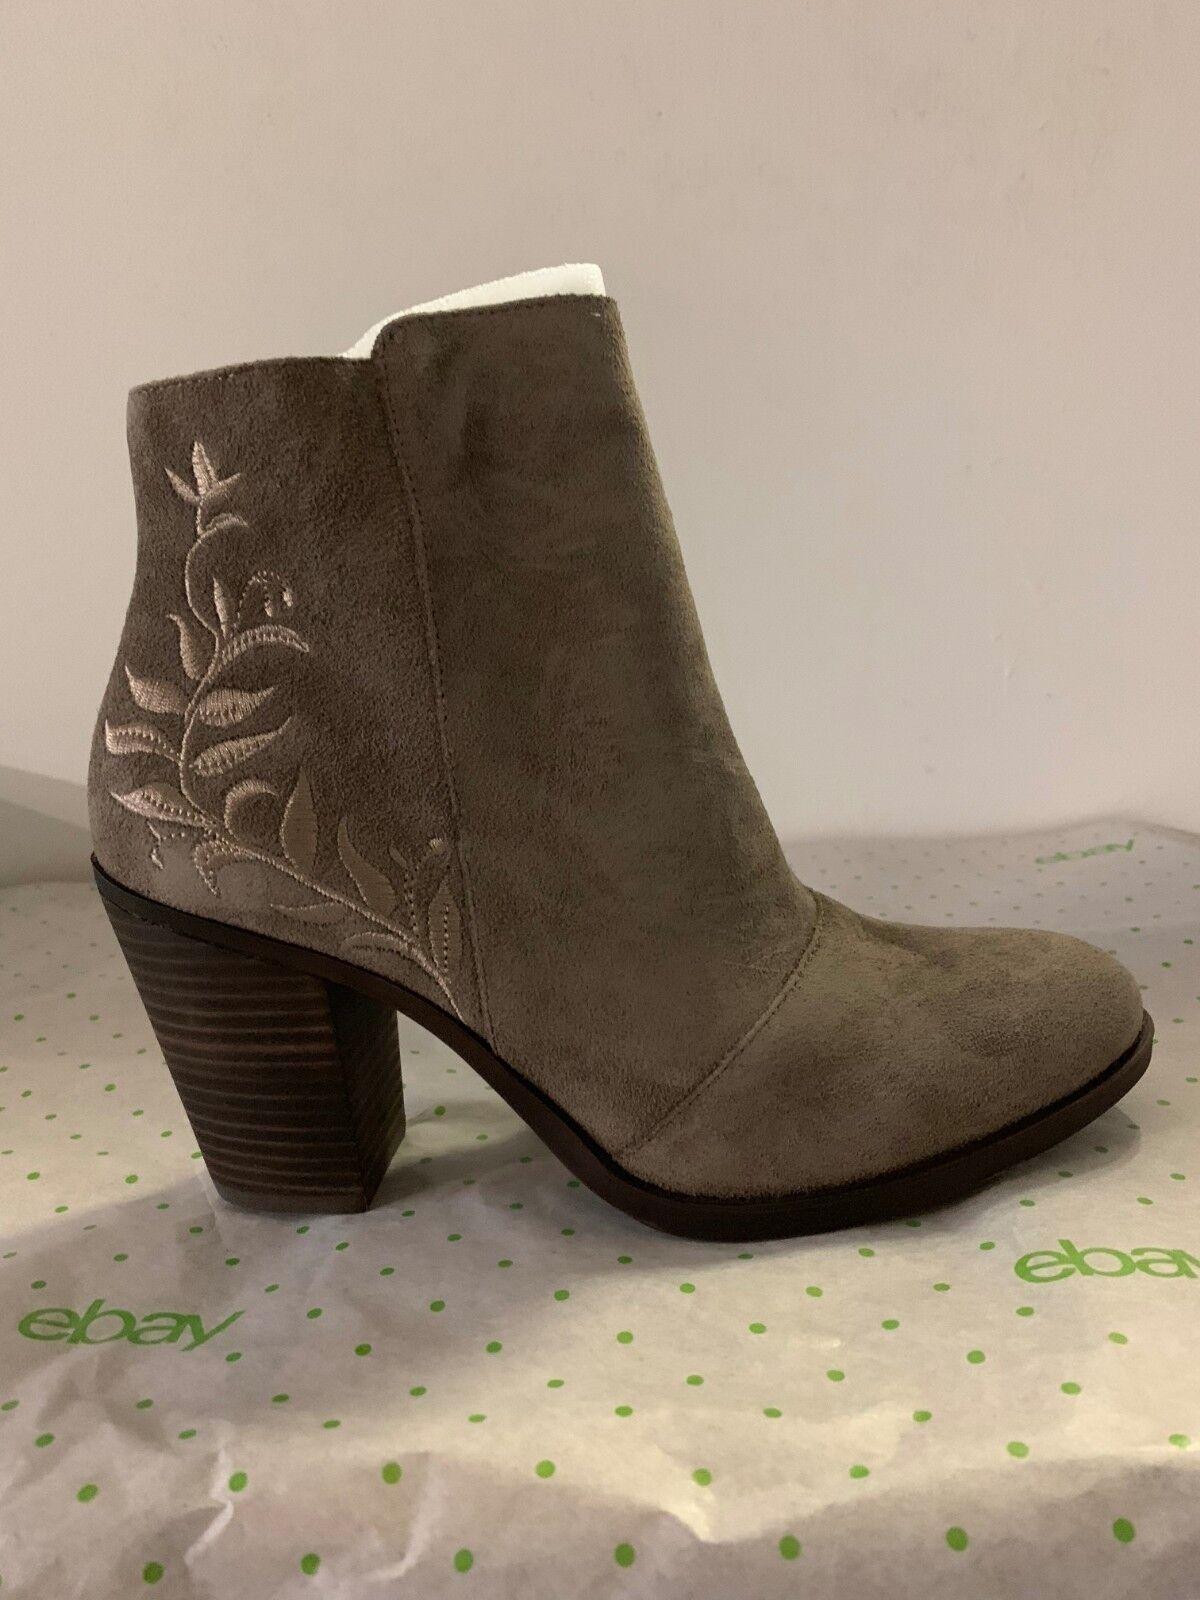 Lucky Brand Elenor Wouomo Fashion Ankle Suede stivali avvioies grigio US 9